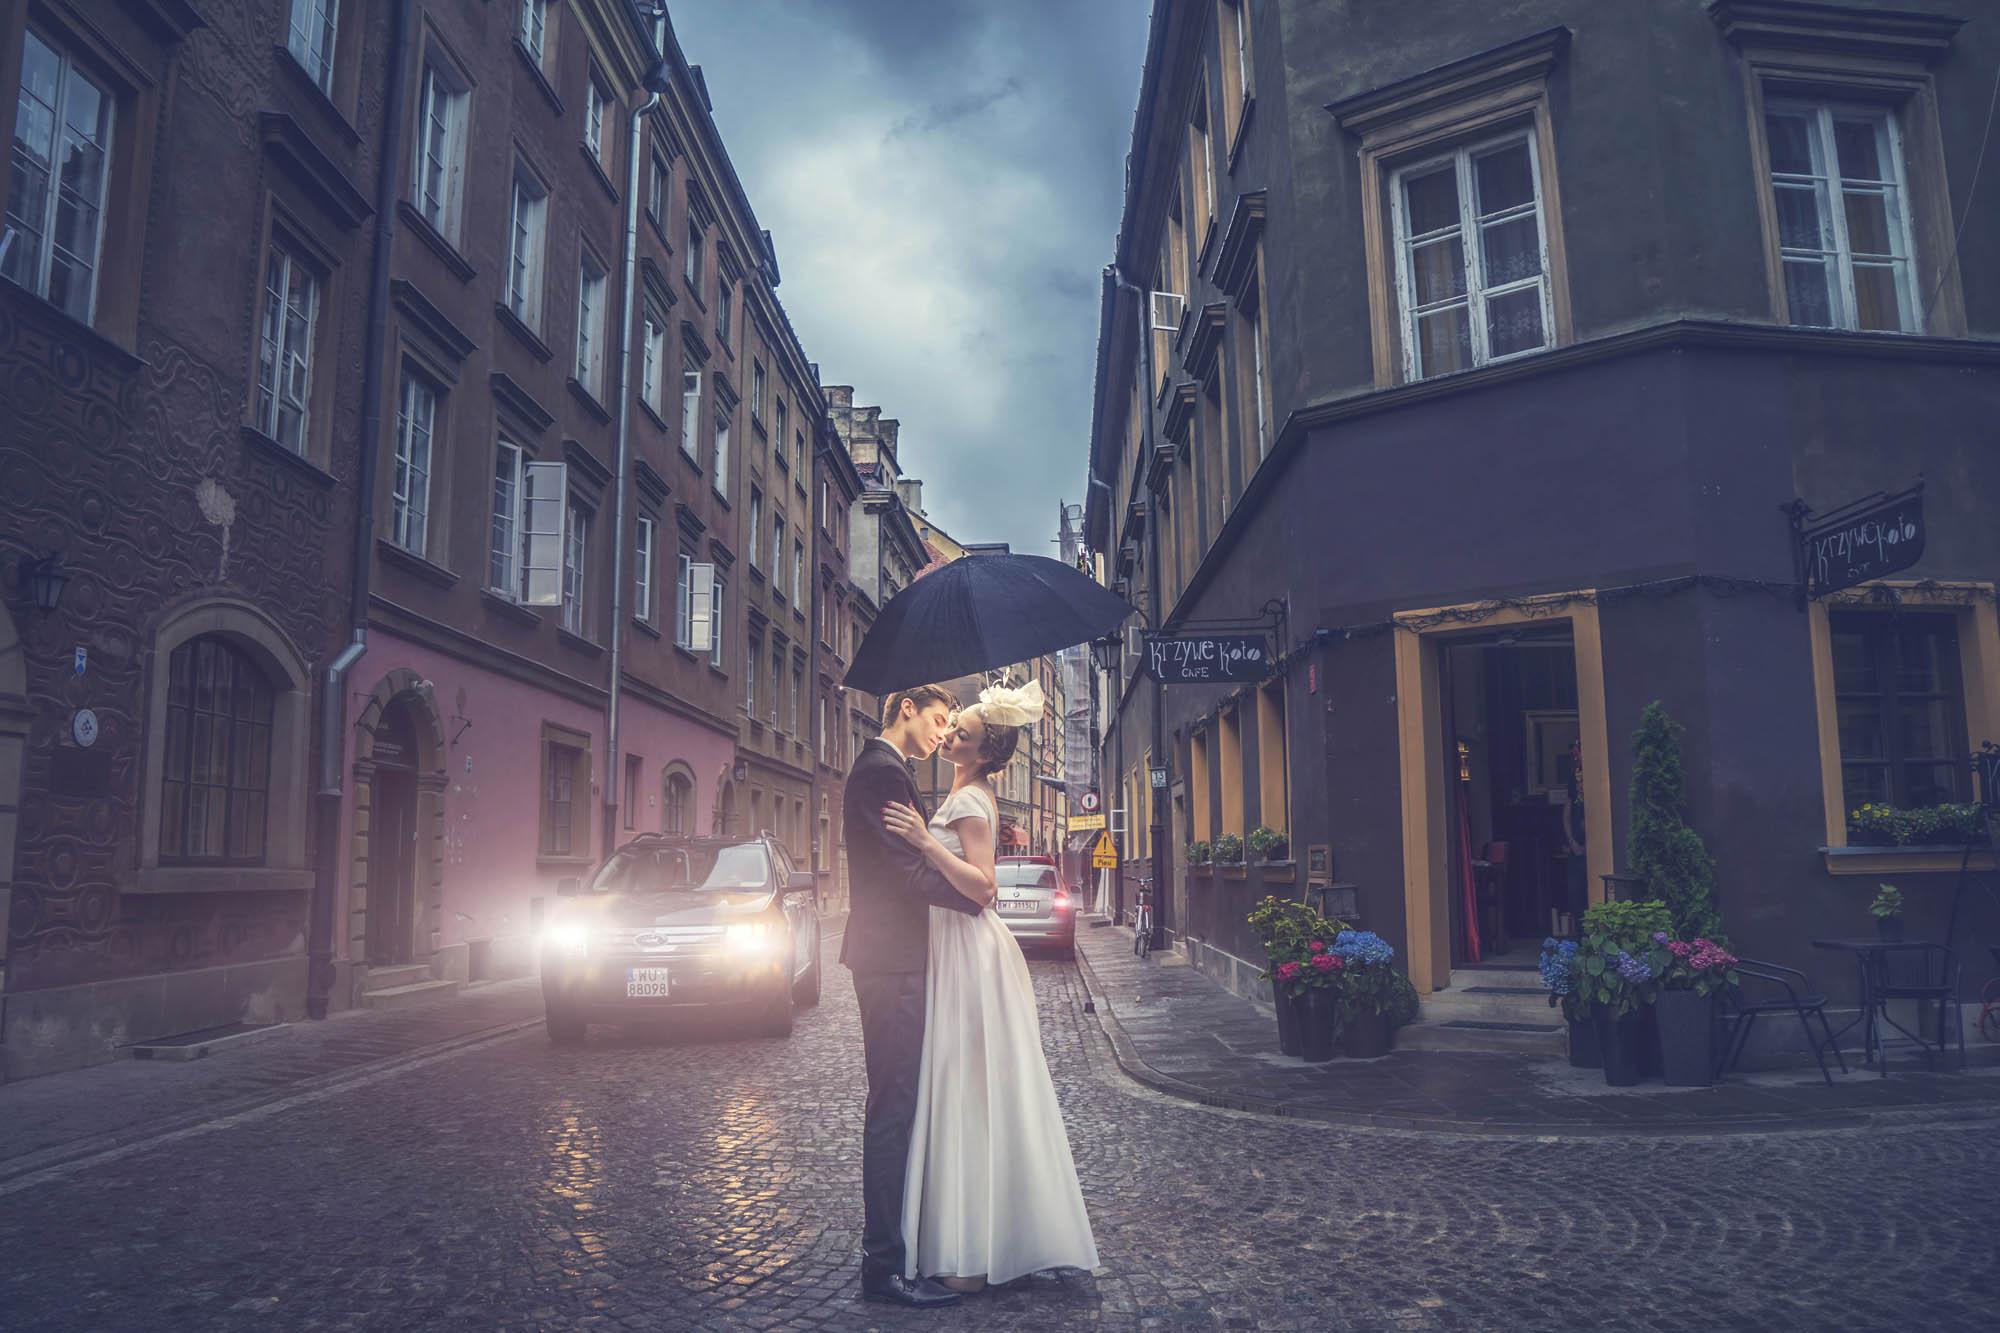 Bride and groom under umbrella in quaint village setting, by CM Leung